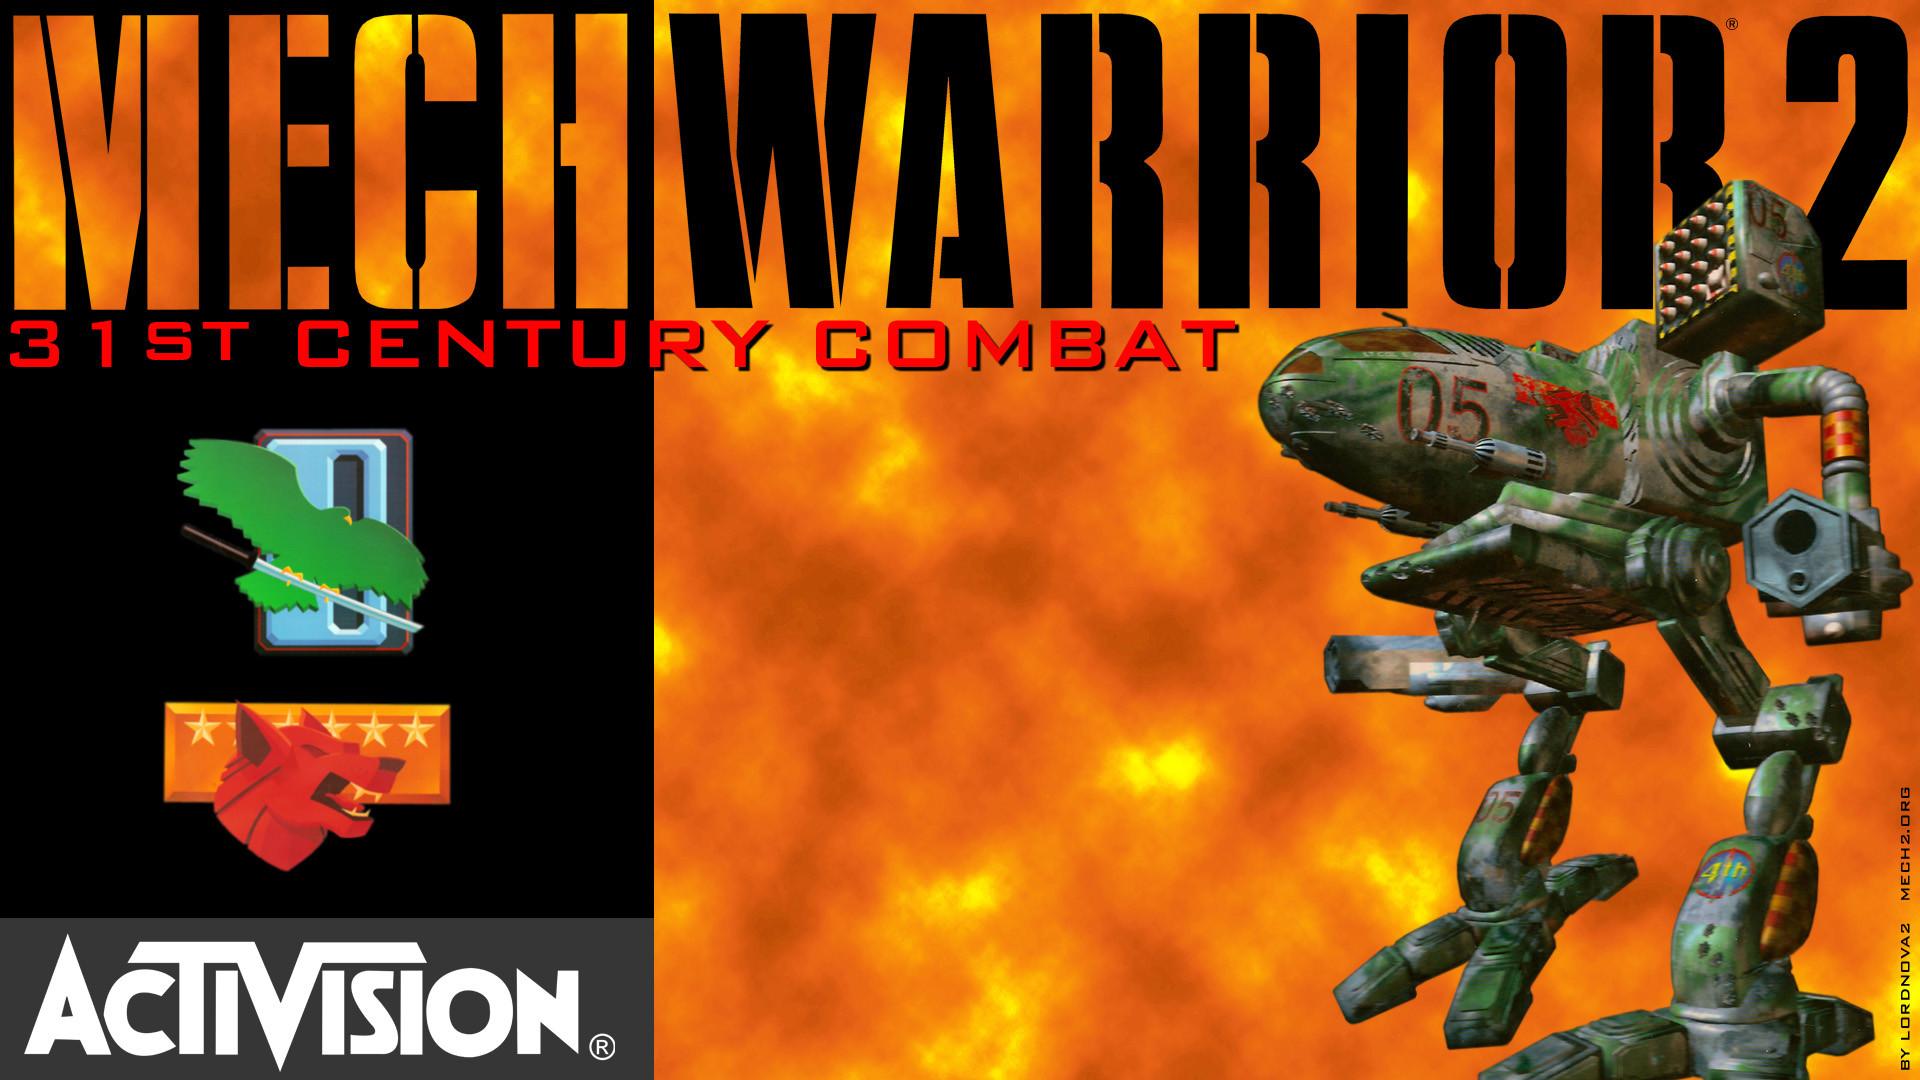 Mechwarrior Desktop Wallpaper (67+ images)